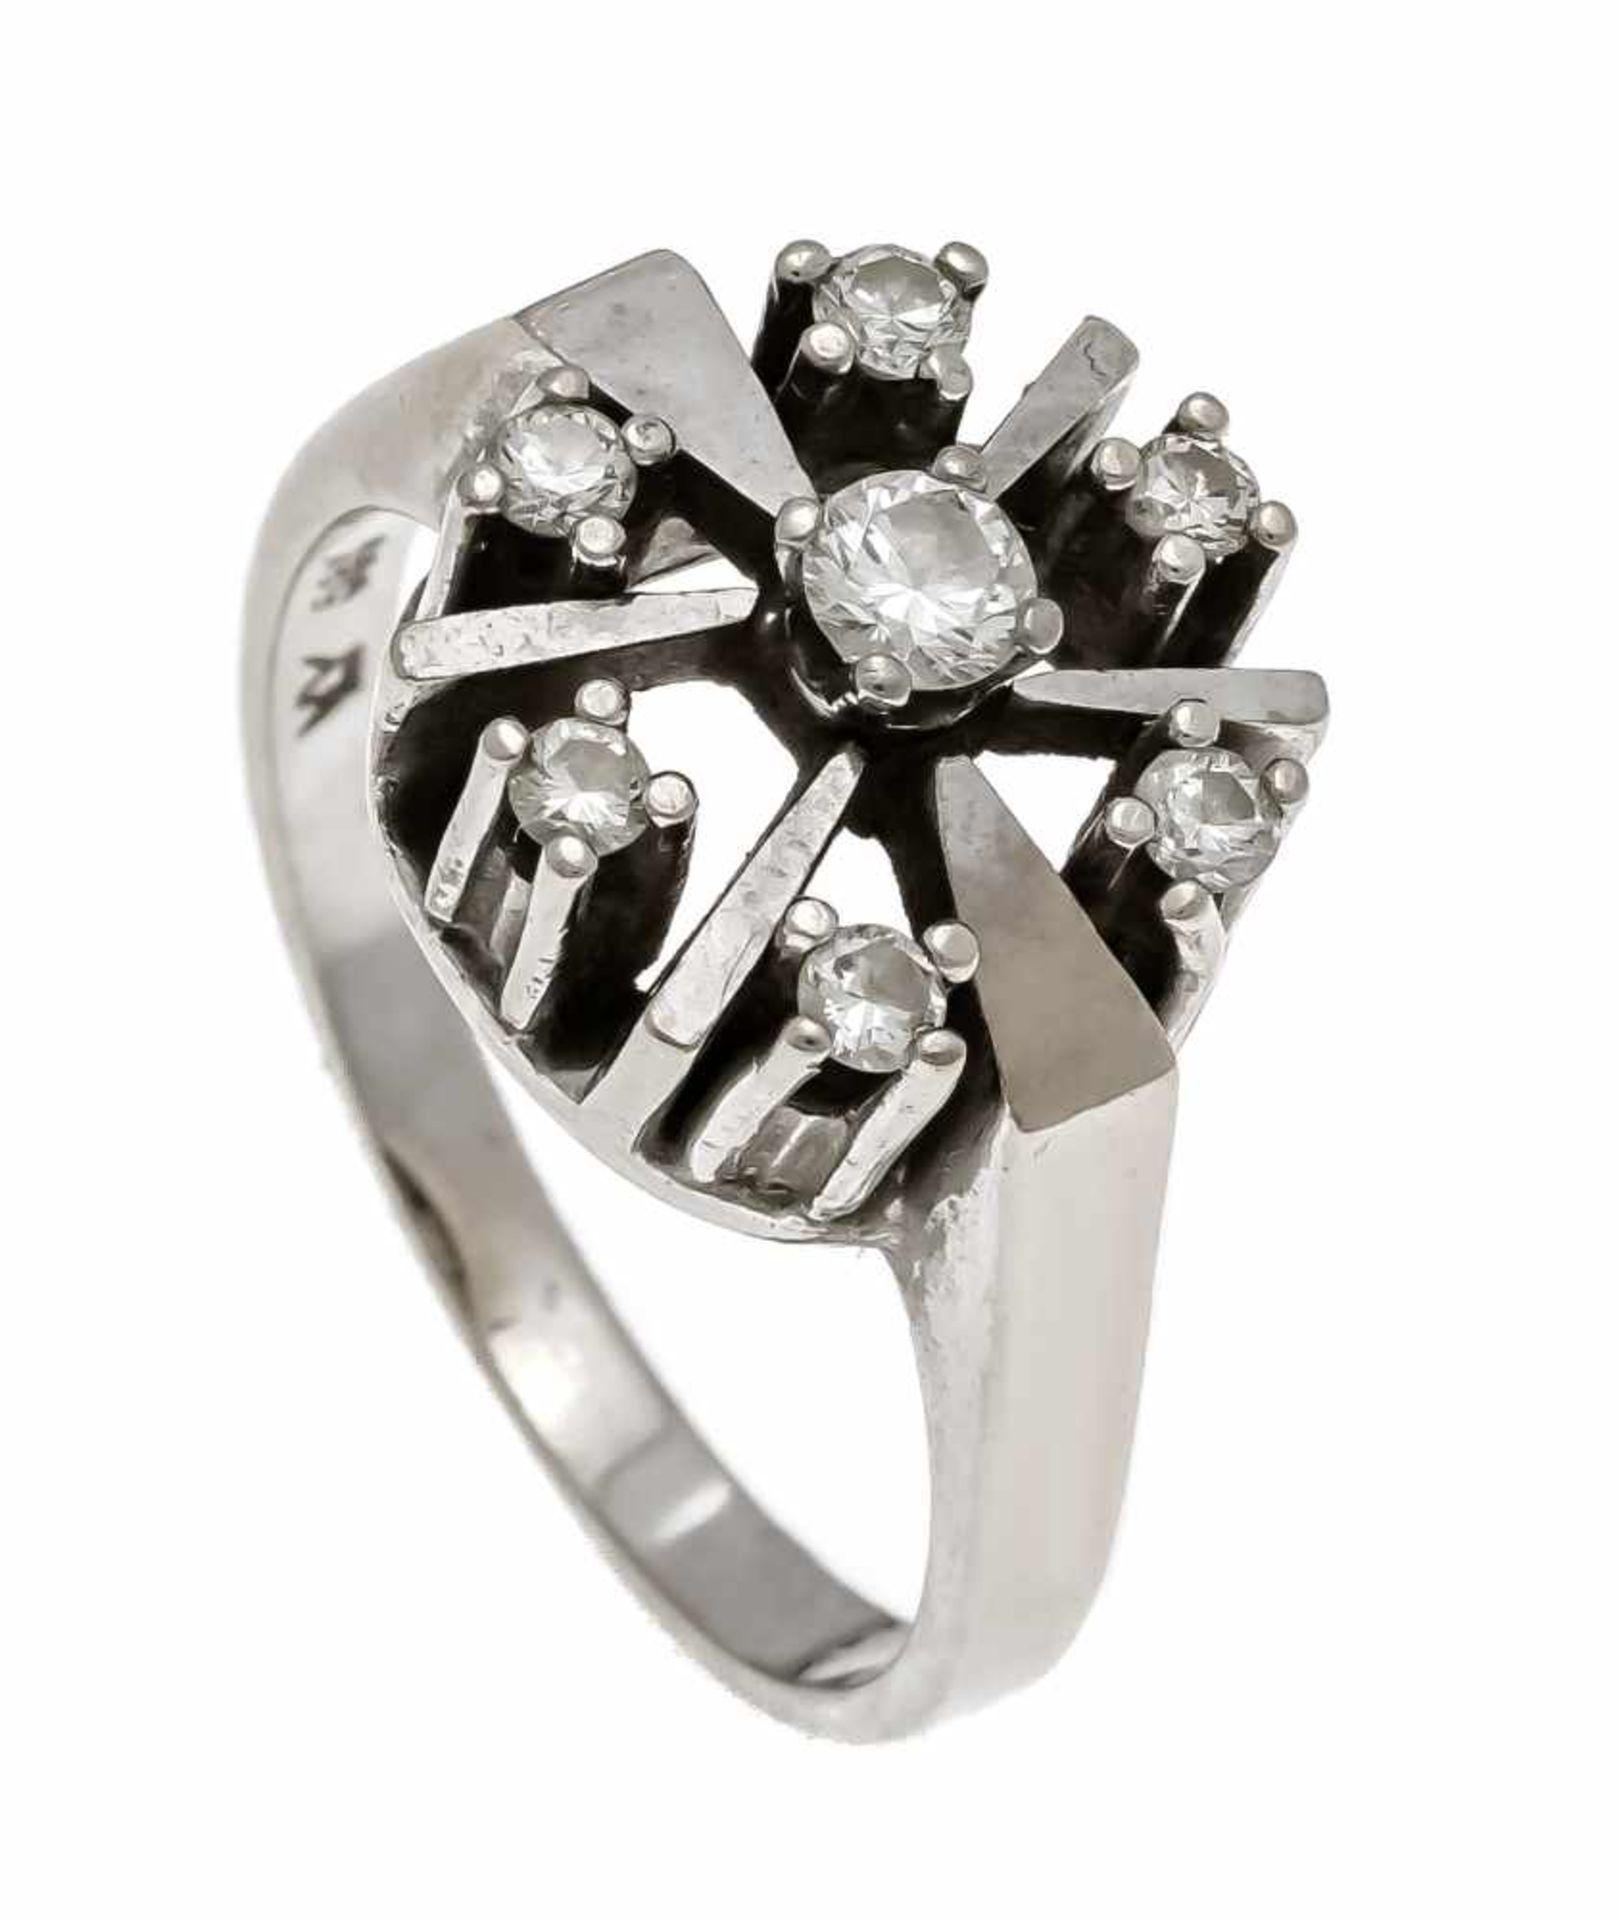 Brillant-Ring WG 585/000 mit 7 Brillanten, zus. 0,32 ct l.get.W/SI, RG 56, 6,3 gDiamond ring WG